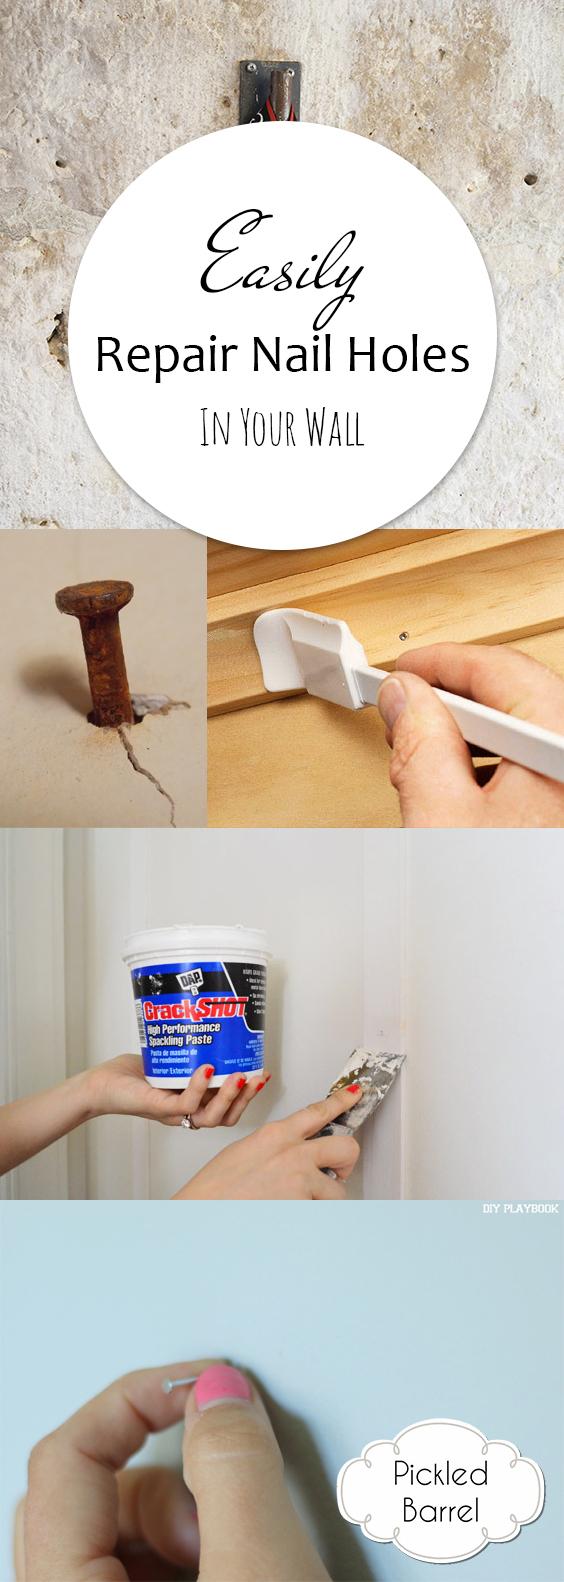 Easily Repair Nail Holes in Your Wall| Home Improvement, Home Improvement Hacks, DIY Home, DIY Home Improvements, Easy Home Improvement Hacks, Home Decor DIYs, Popular Pin #HomeImprovements #HomeDecor